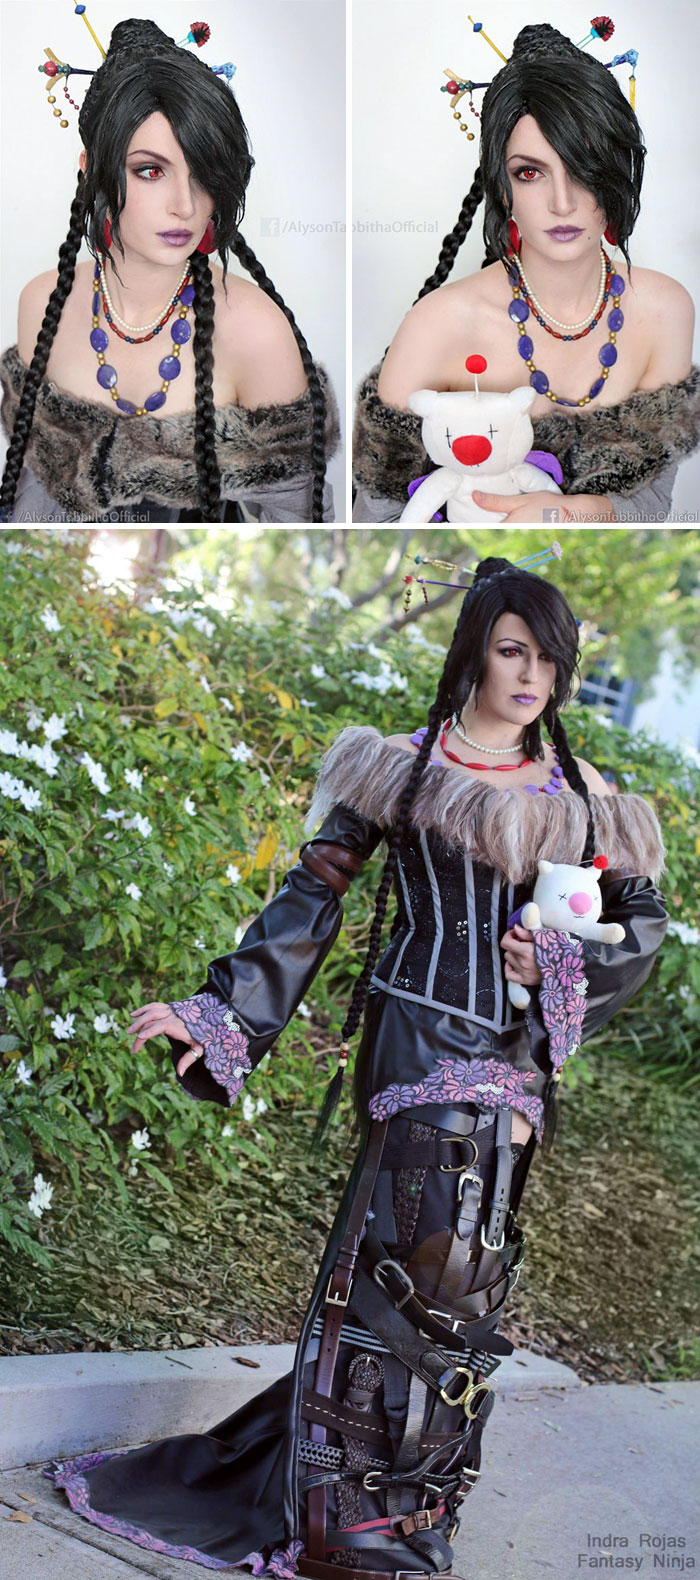 Alyson-Tabbitha-cosplays (18)